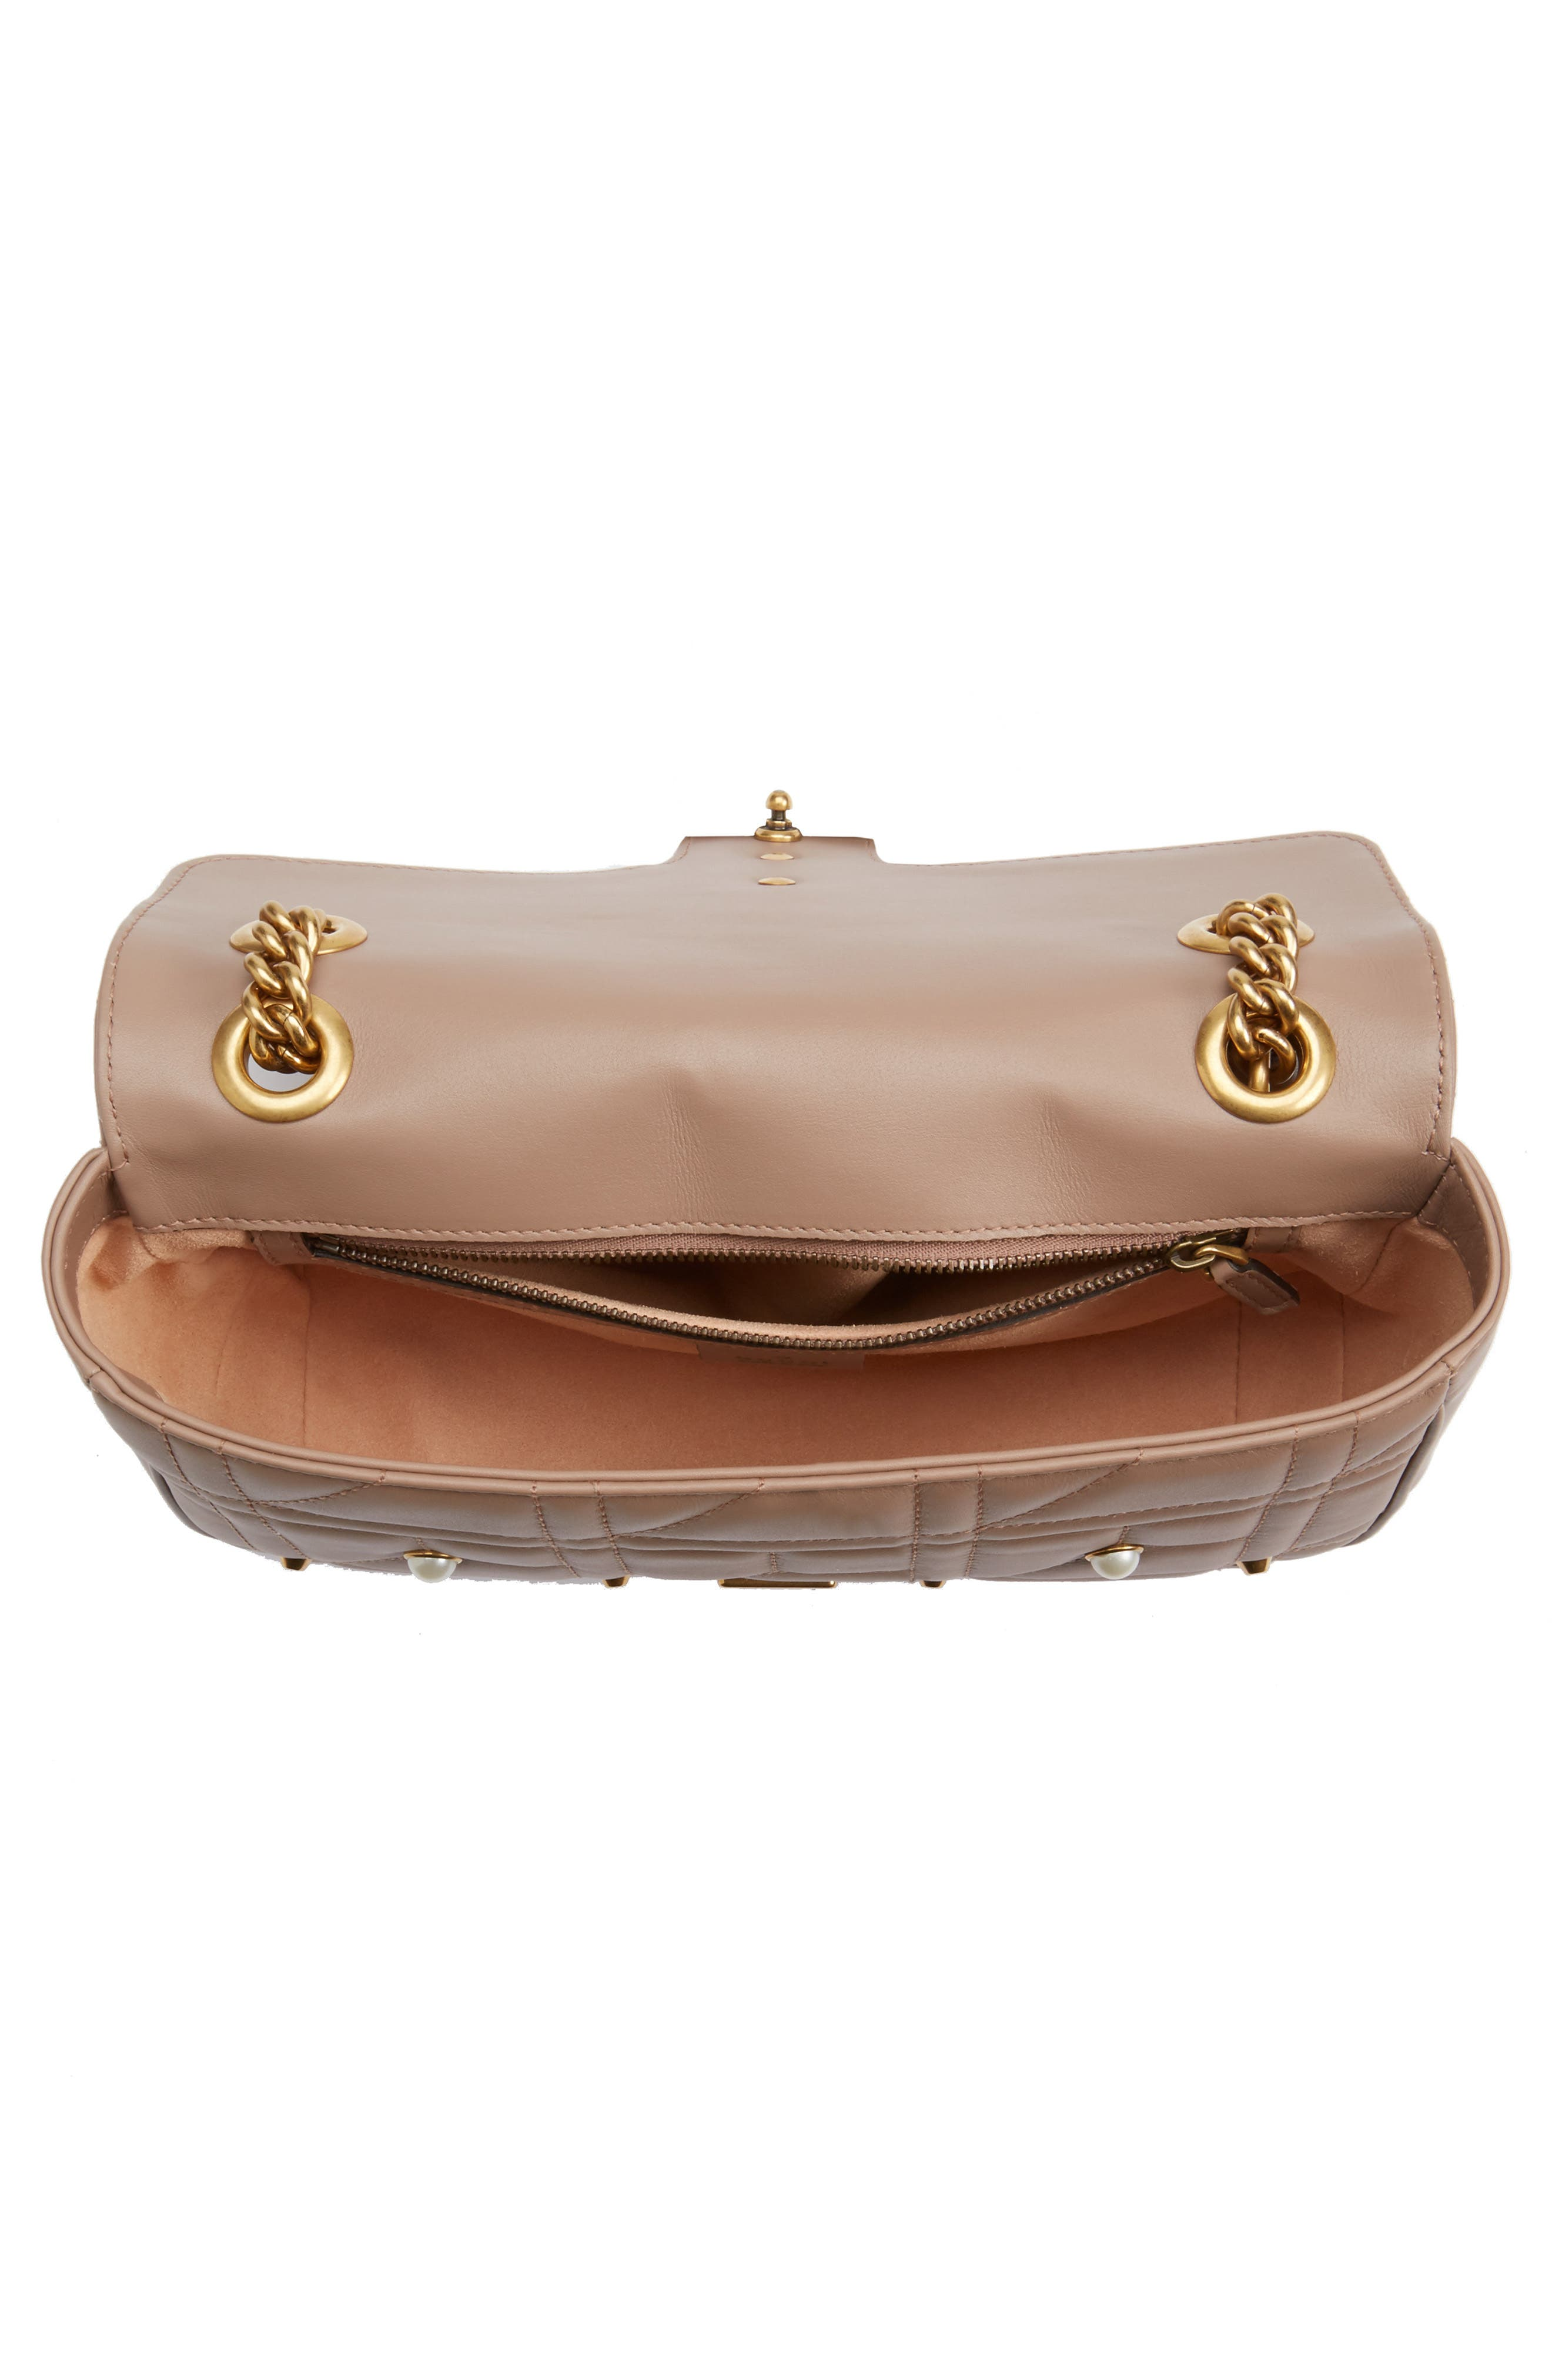 GG Marmont Matelassé Imitation Pearl Leather Shoulder Bag,                             Alternate thumbnail 3, color,                             White/ Pink